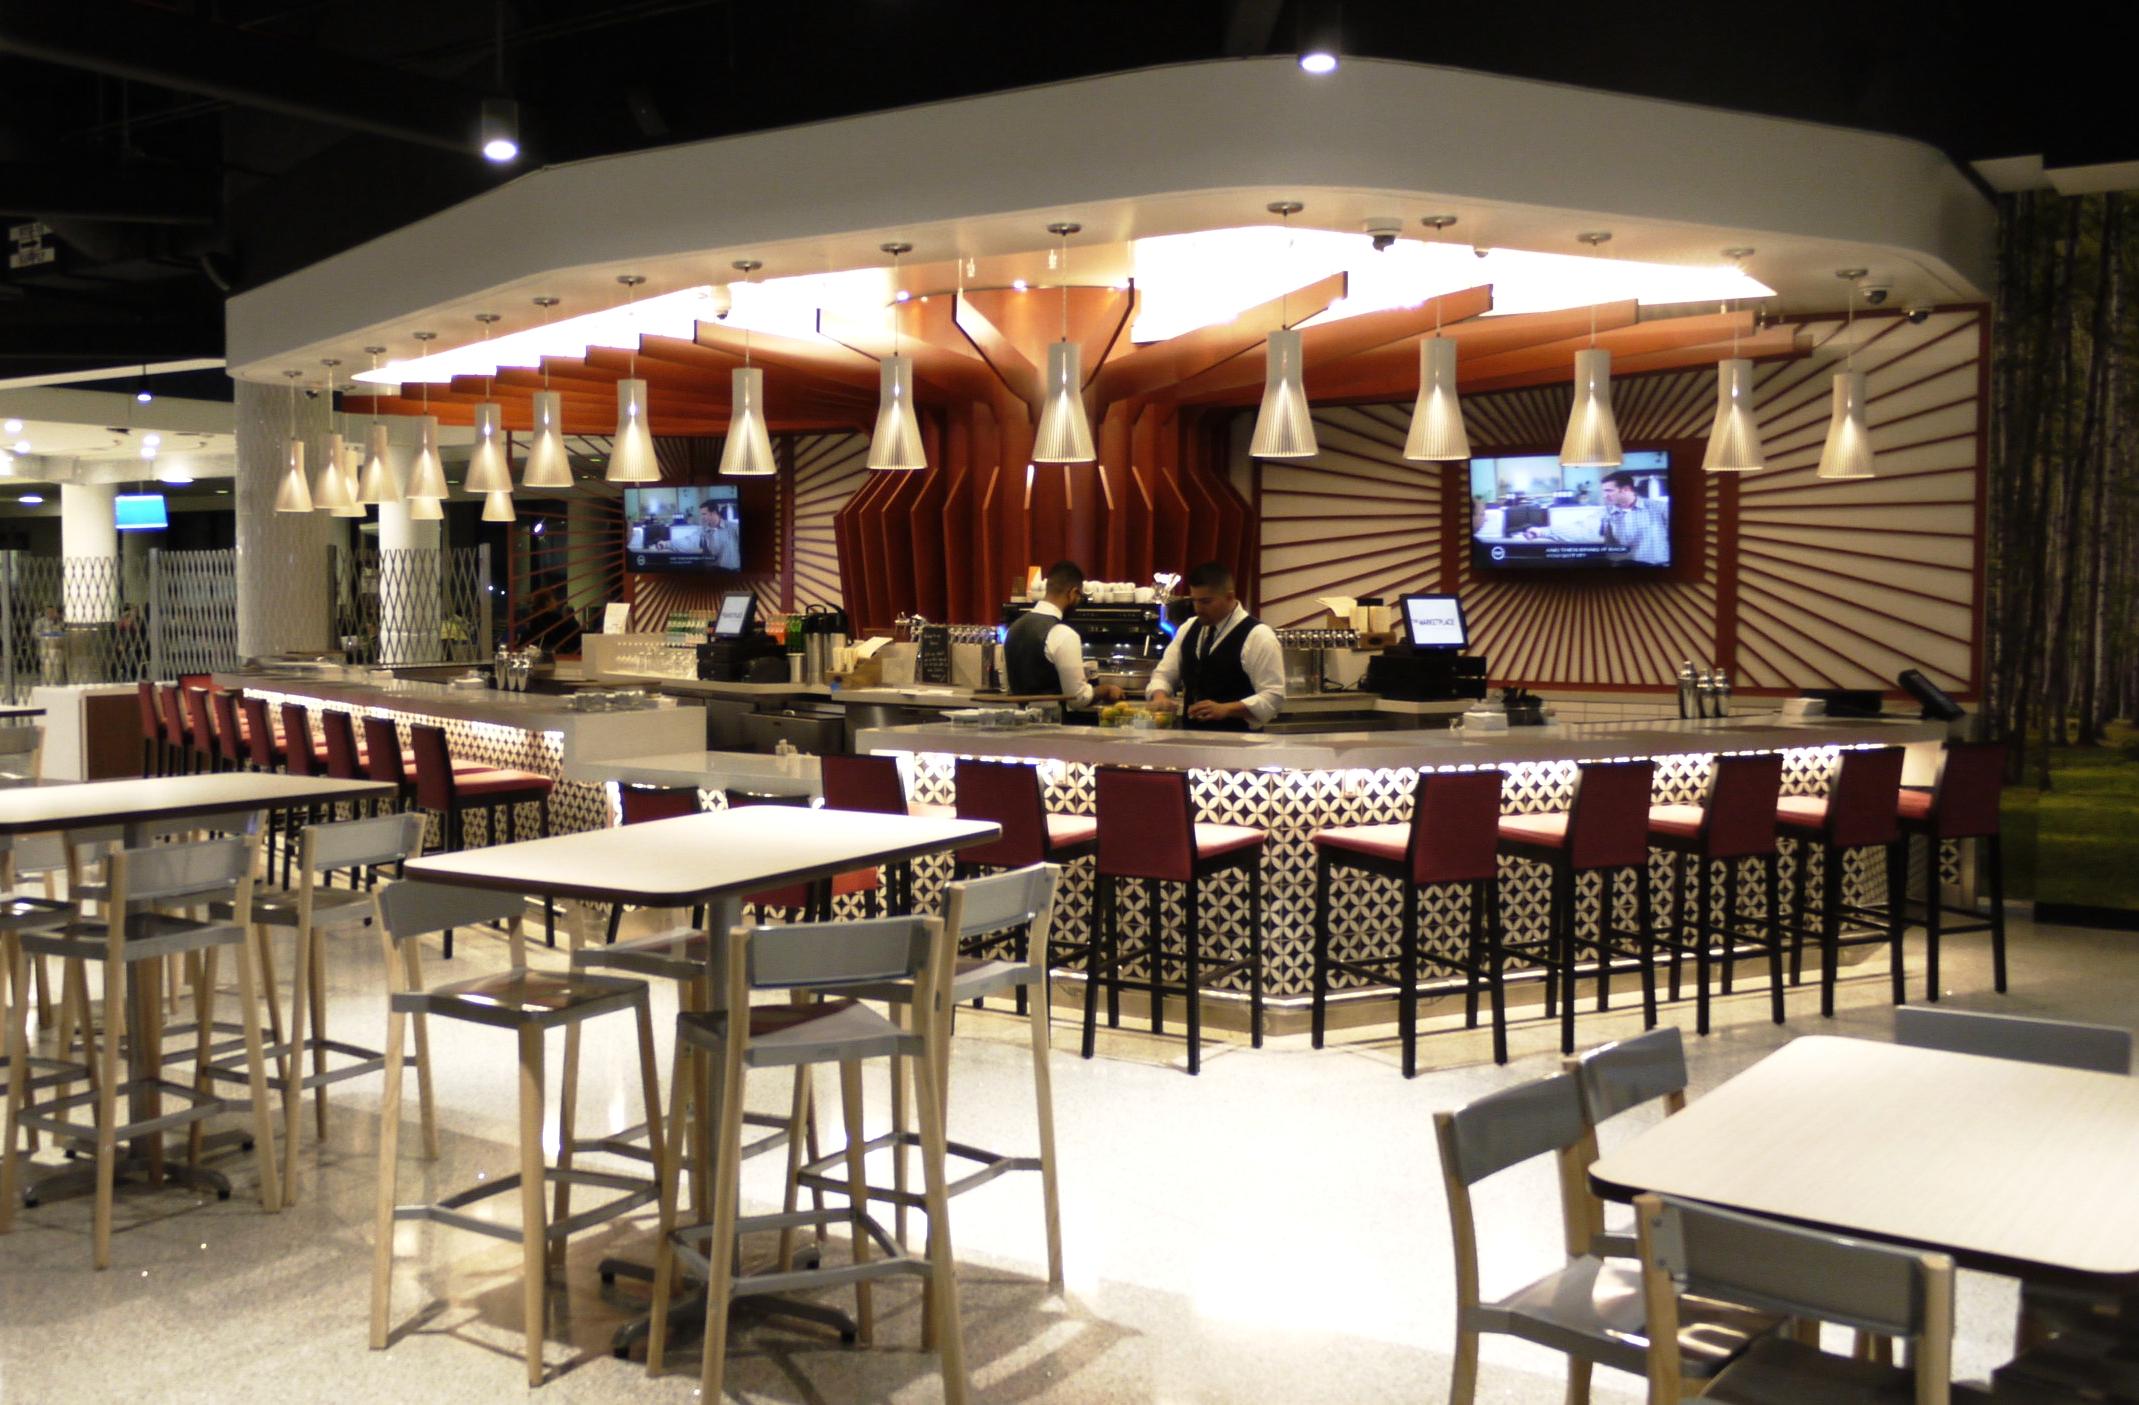 LAX Terminal 6 Wolfgang Puck Food Court